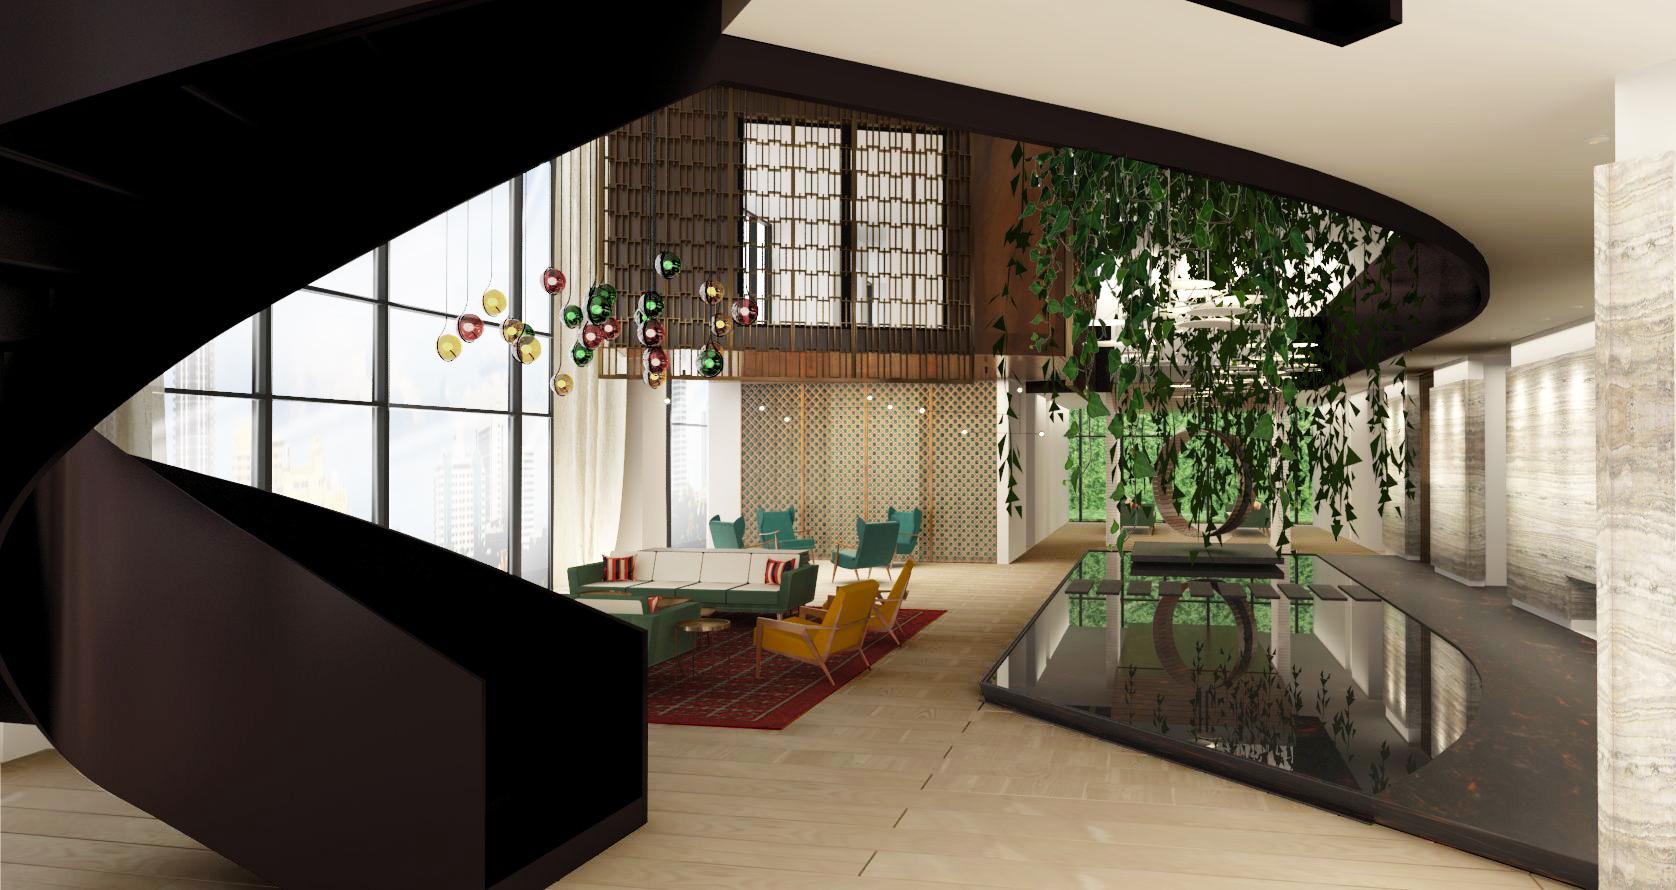 luis-pons-design-interior-tropical-Miami-Beach_1.jpg